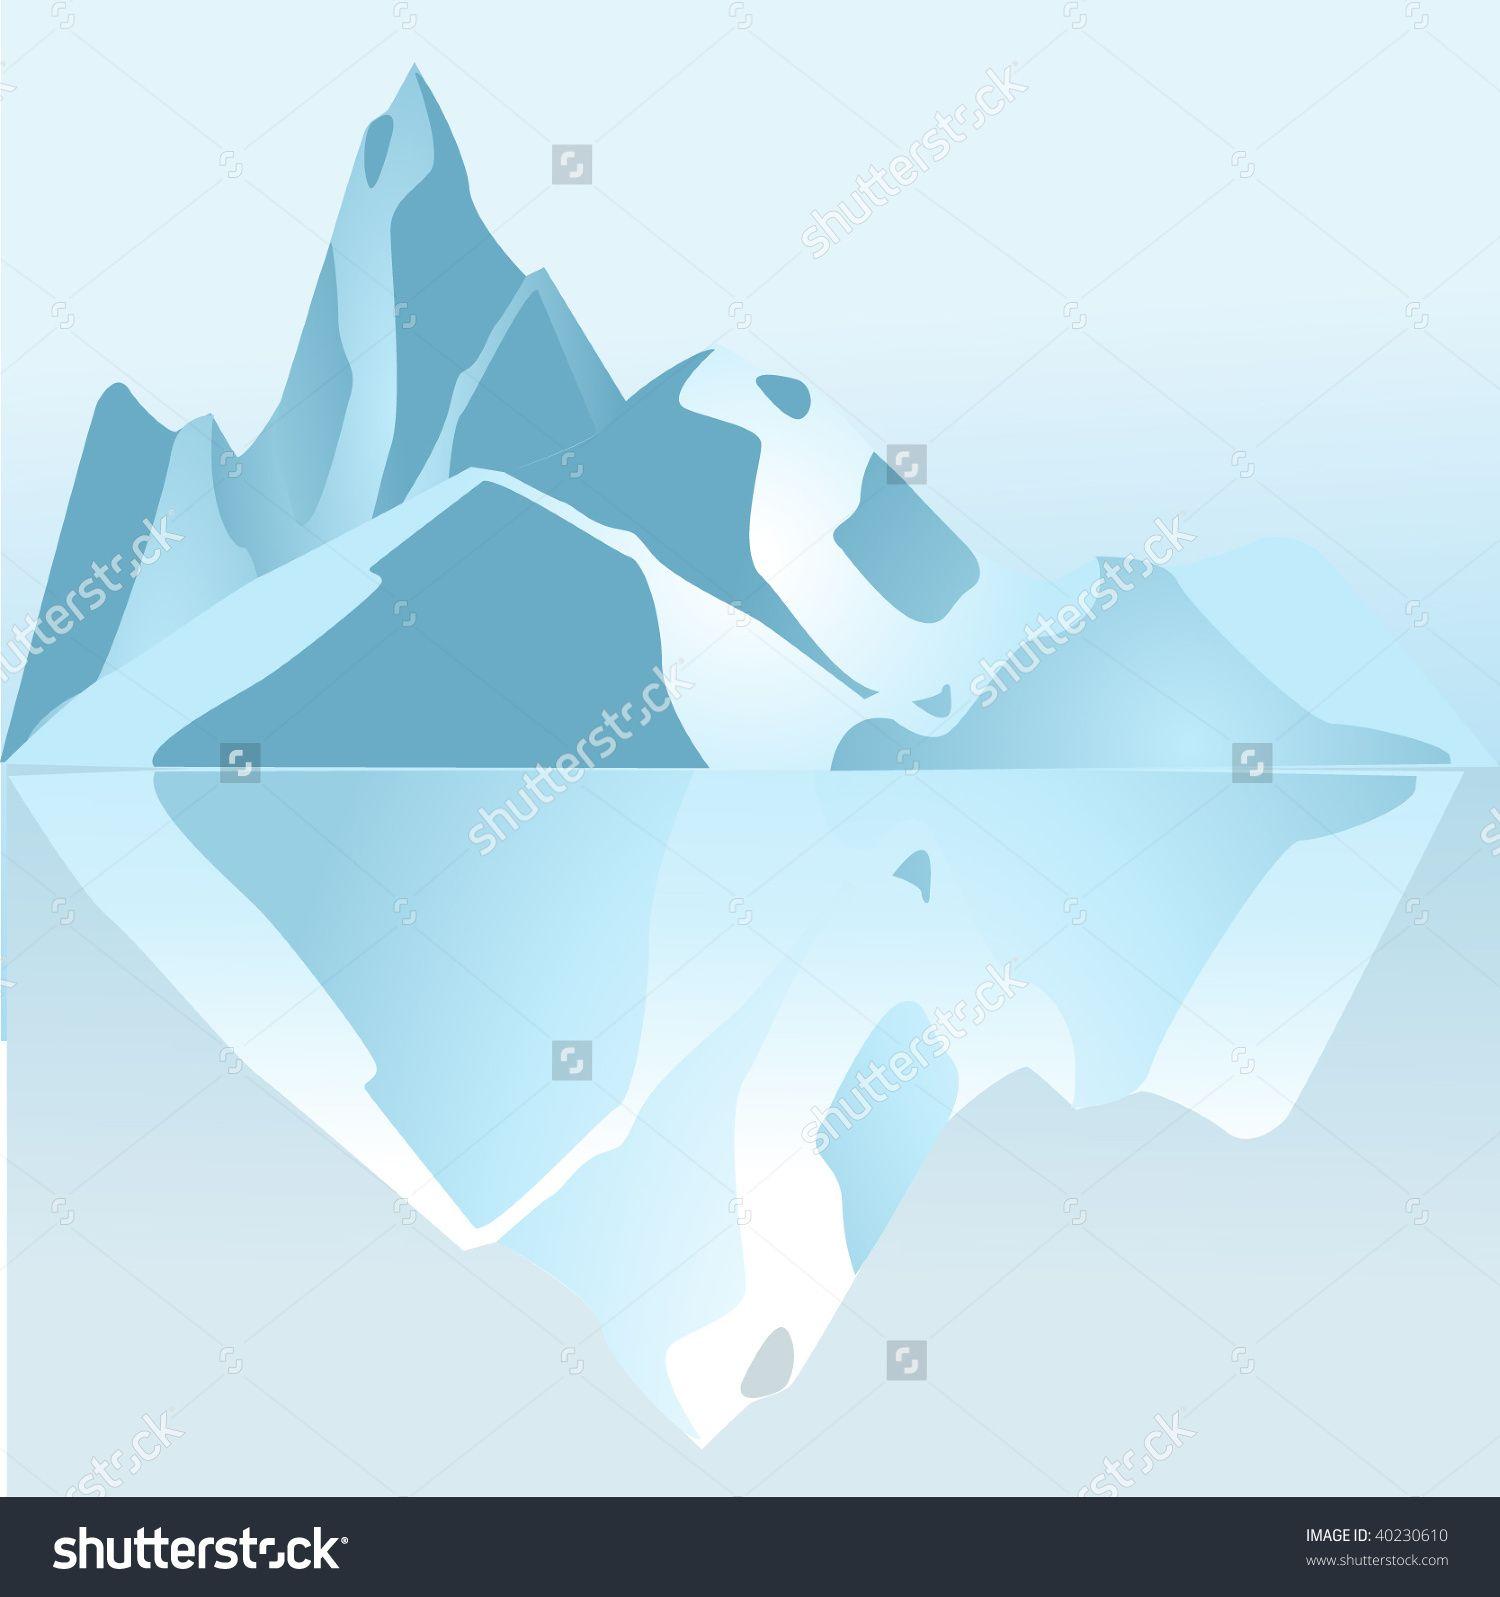 Glacier clipart landscape arctic. Pin by maddy merzvinskis